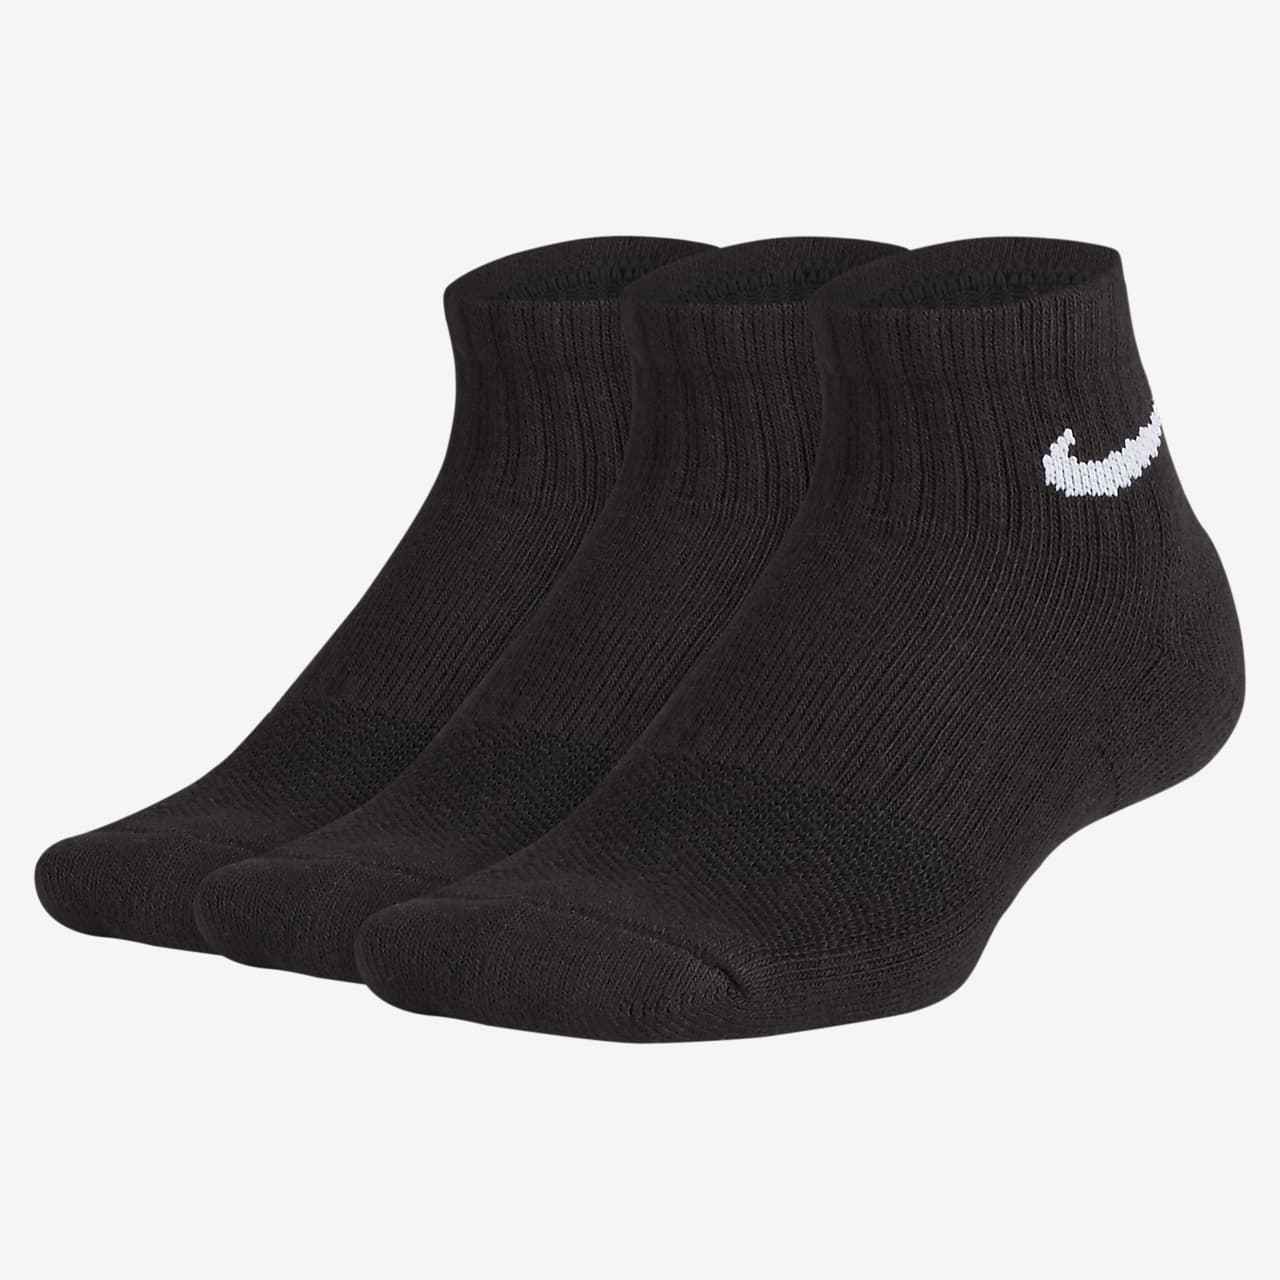 Nike Everyday gepolsterte Knöchelsocken für Kinder (3 Paar)